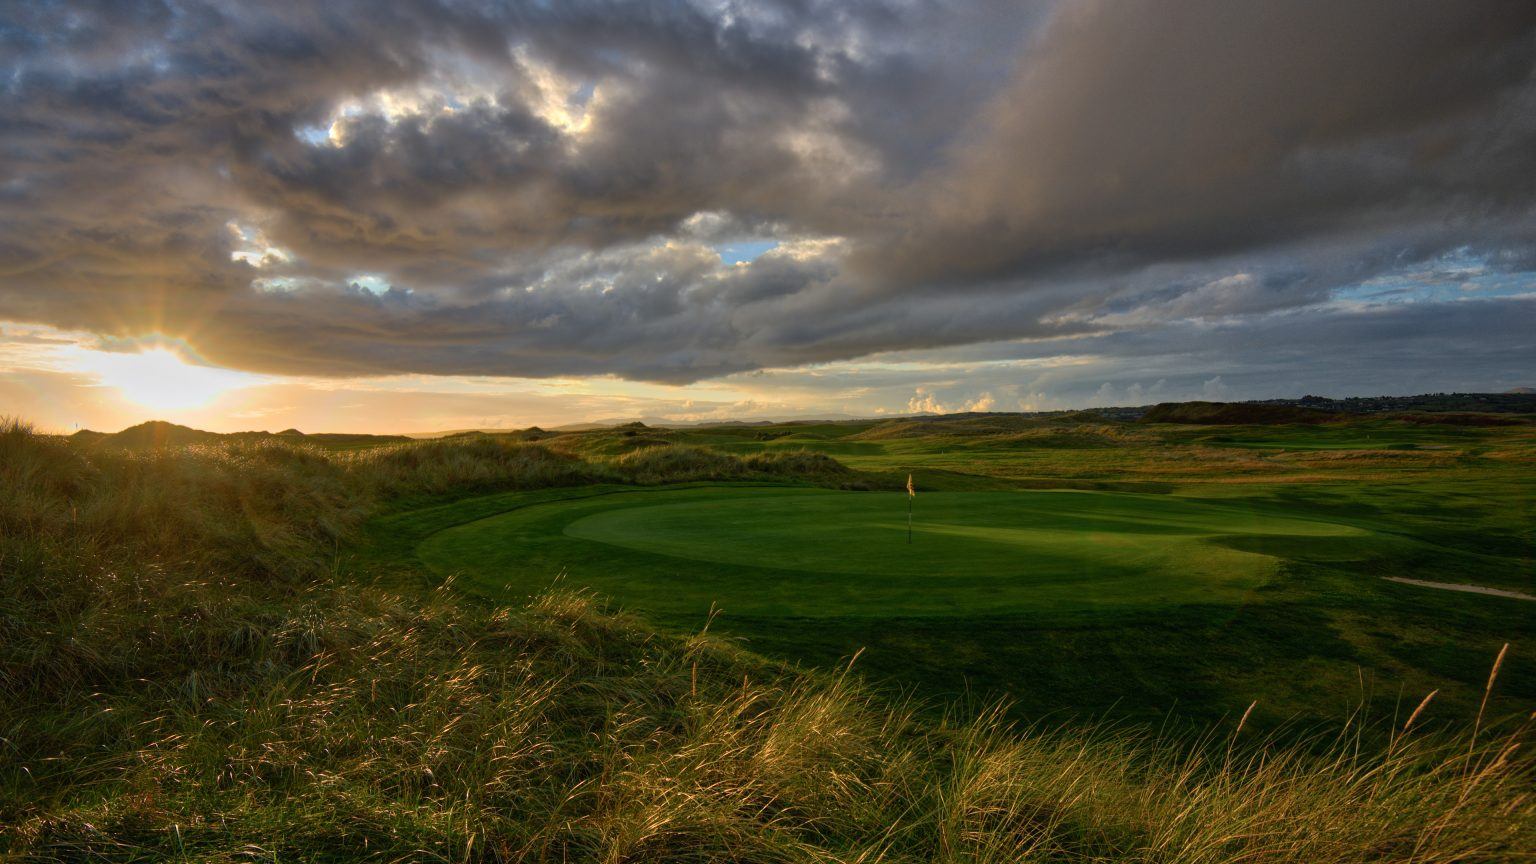 Donegal Golf Club (Championship Links), Murvagh, Ireland